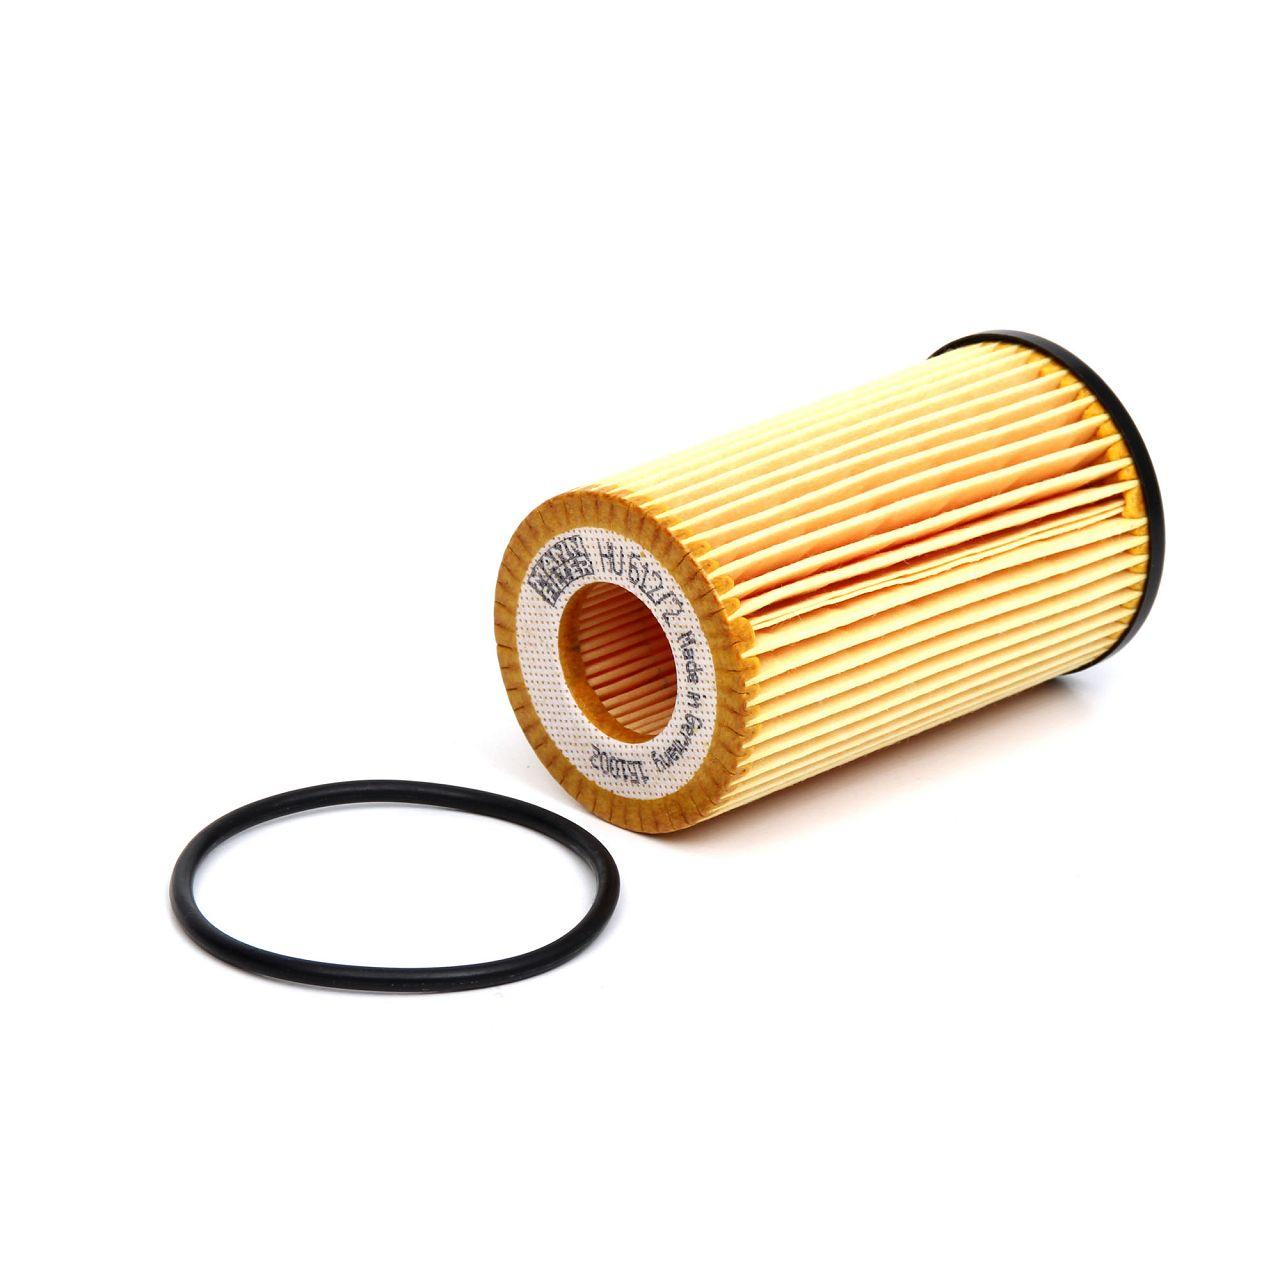 MANN Filterset für OPEL INSIGNIA A 1.4/LPG 1.6 Turbo SAAB 9-5 (YS3G) 1.6 Turbo